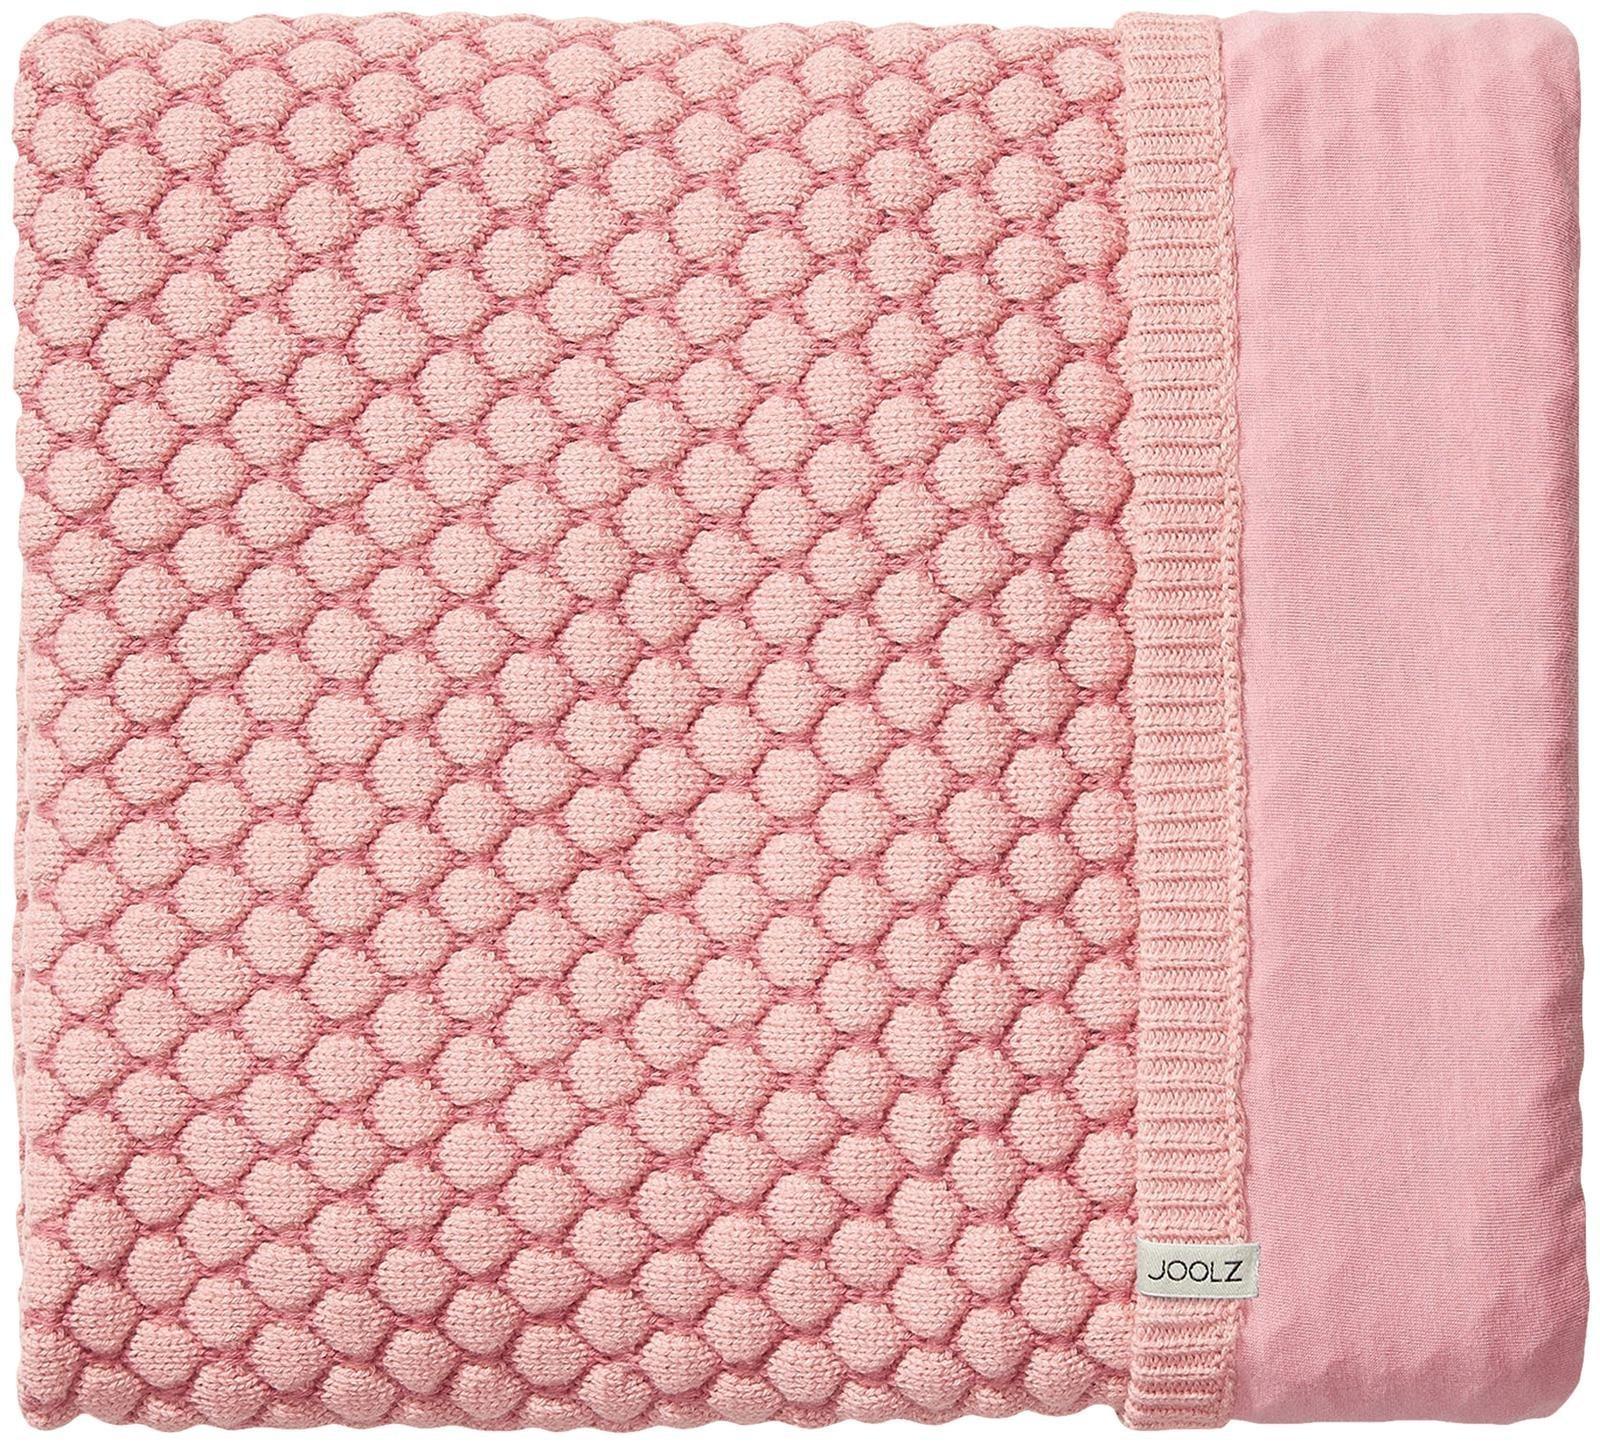 Joolz Essentials Honeycomb Blanket, Pink by Joolz